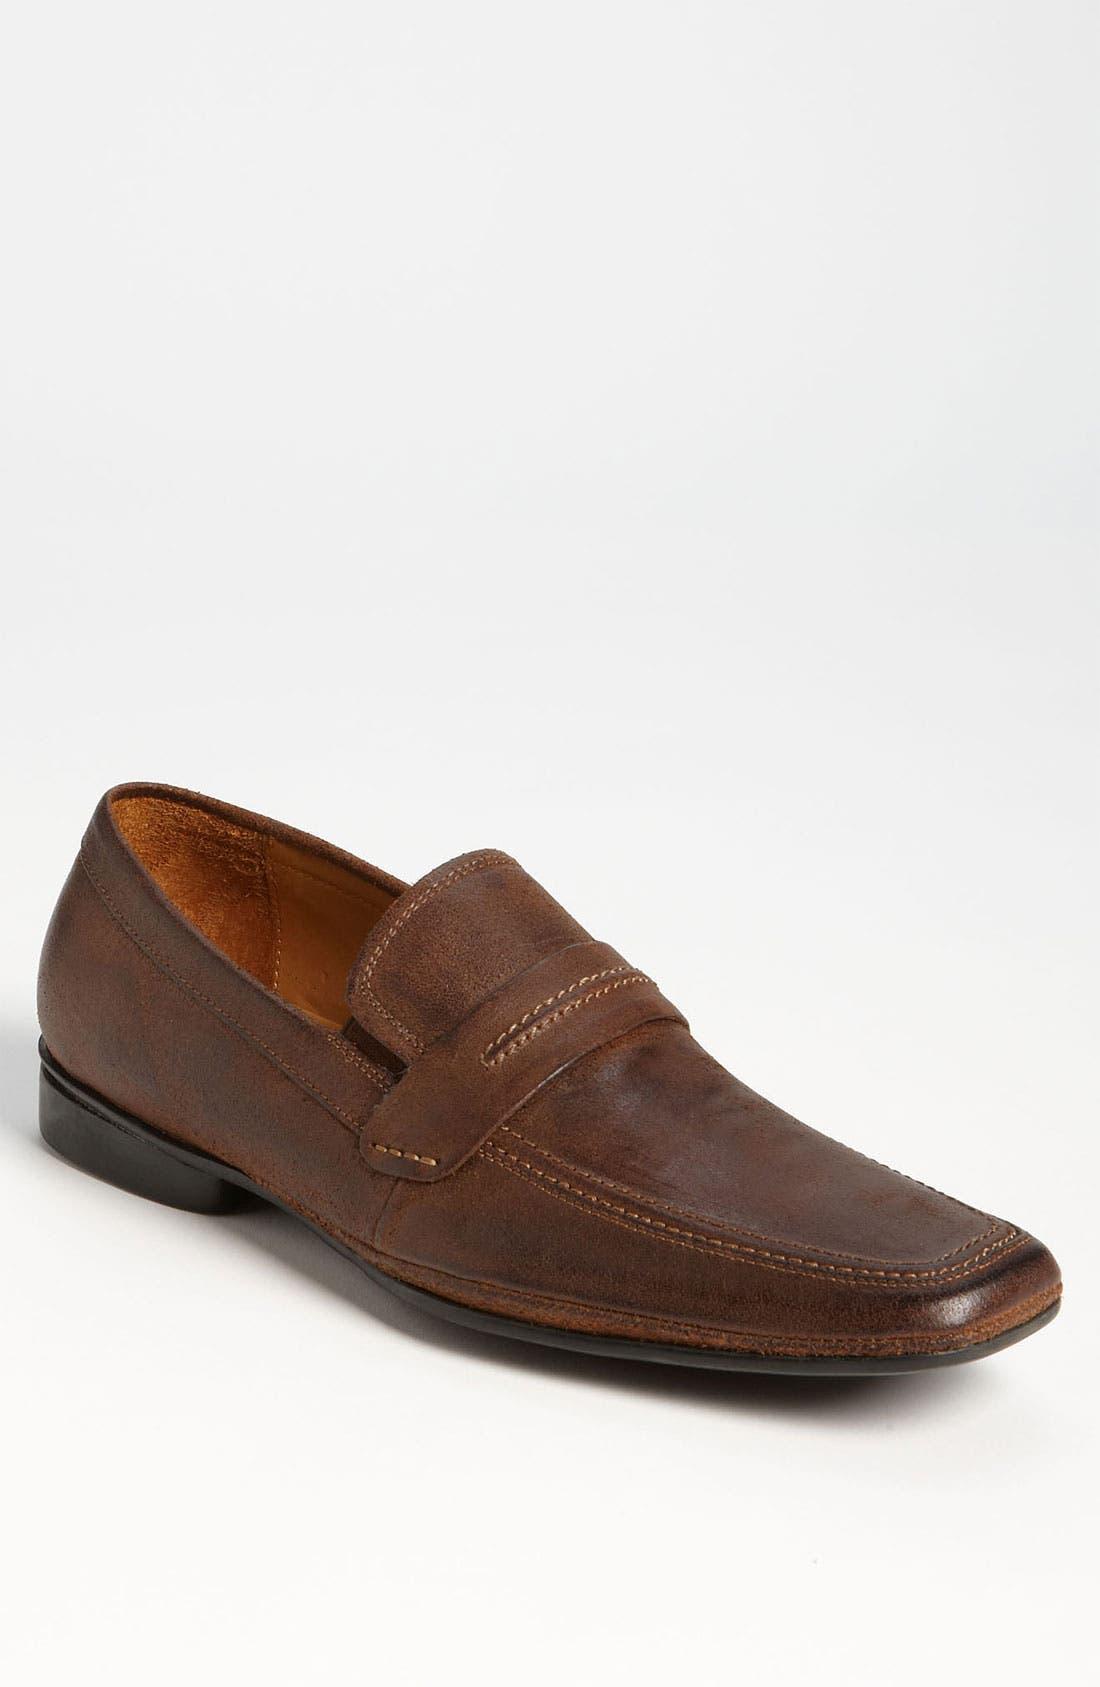 Alternate Image 1 Selected - ALDO 'Greaves' Loafer